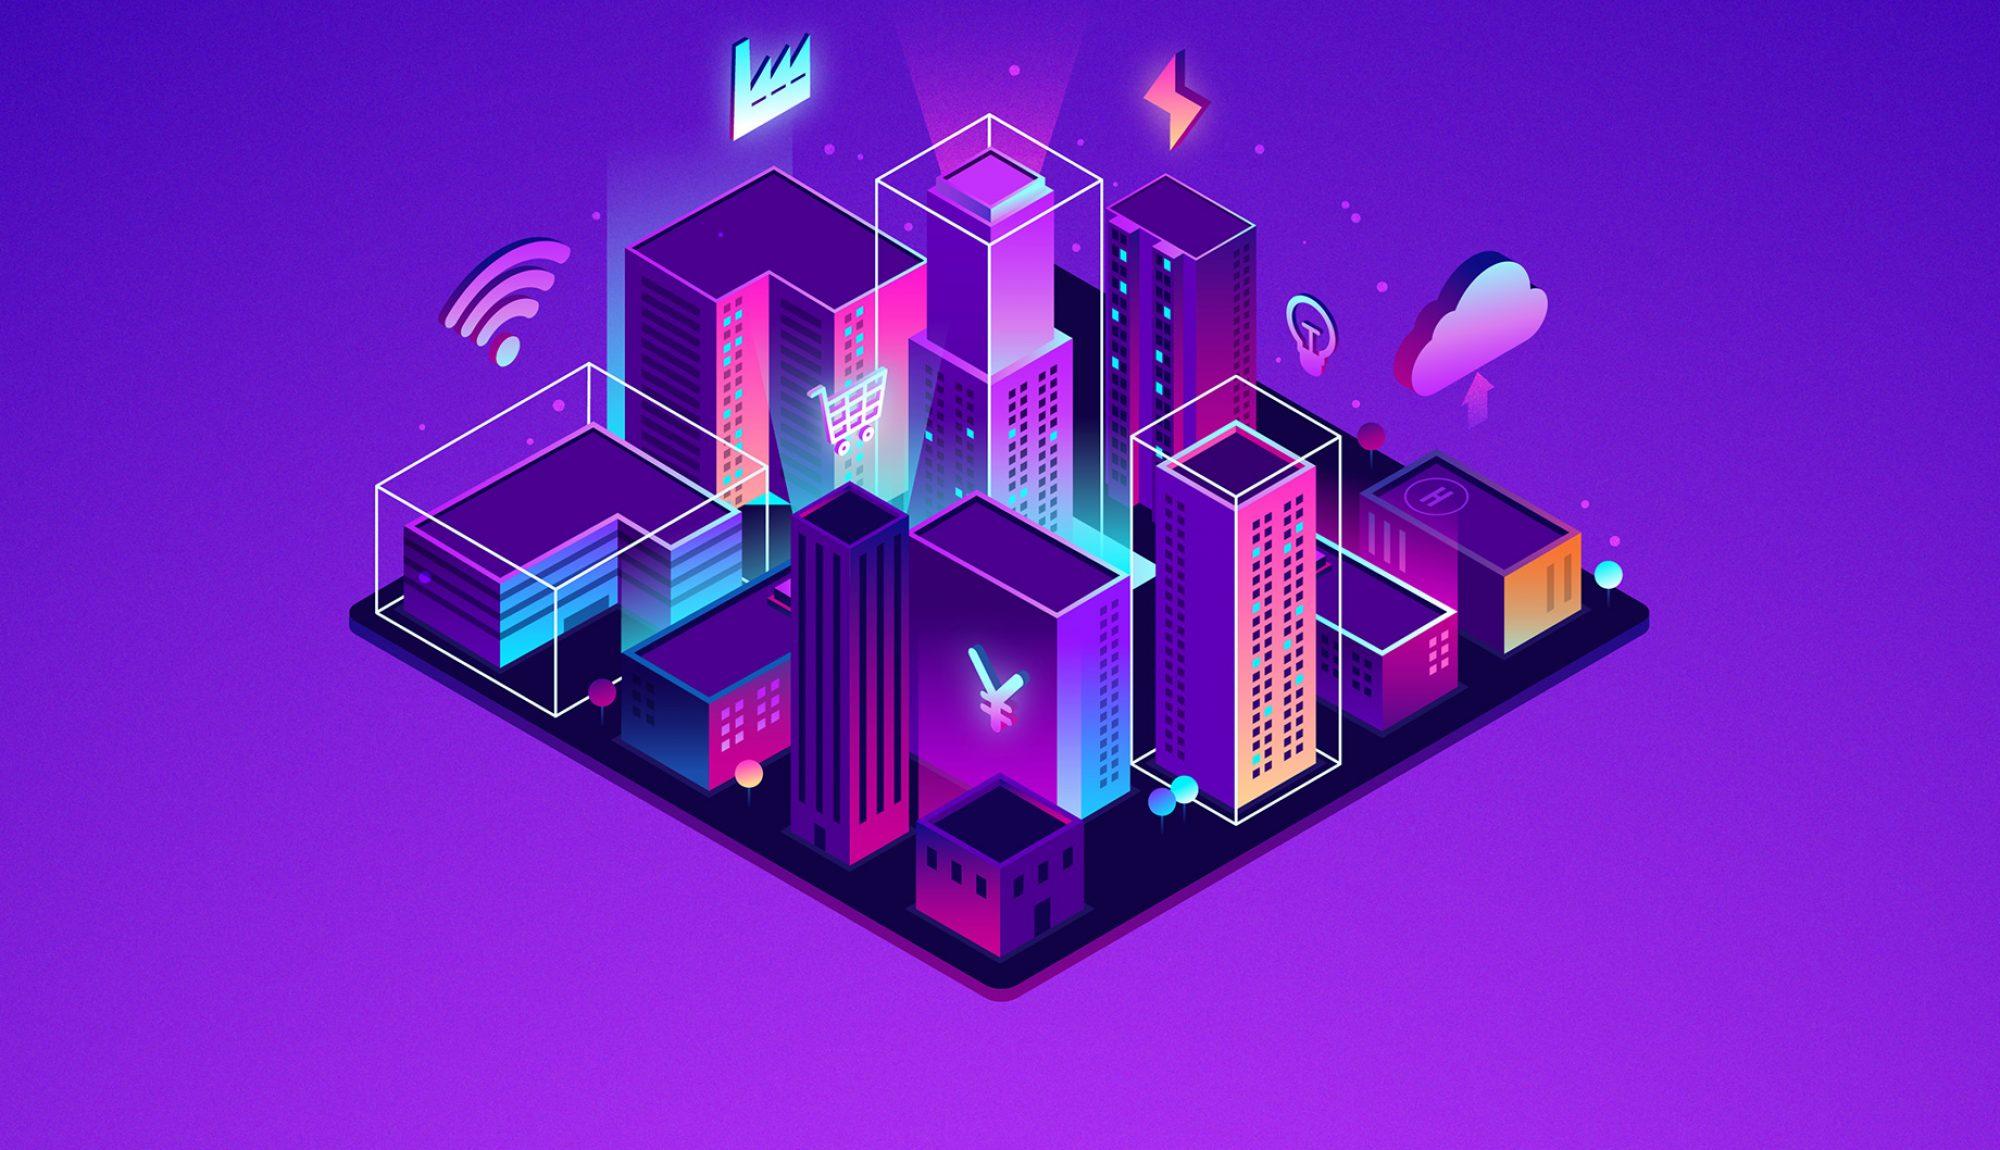 Smarter buildings… Building smarter